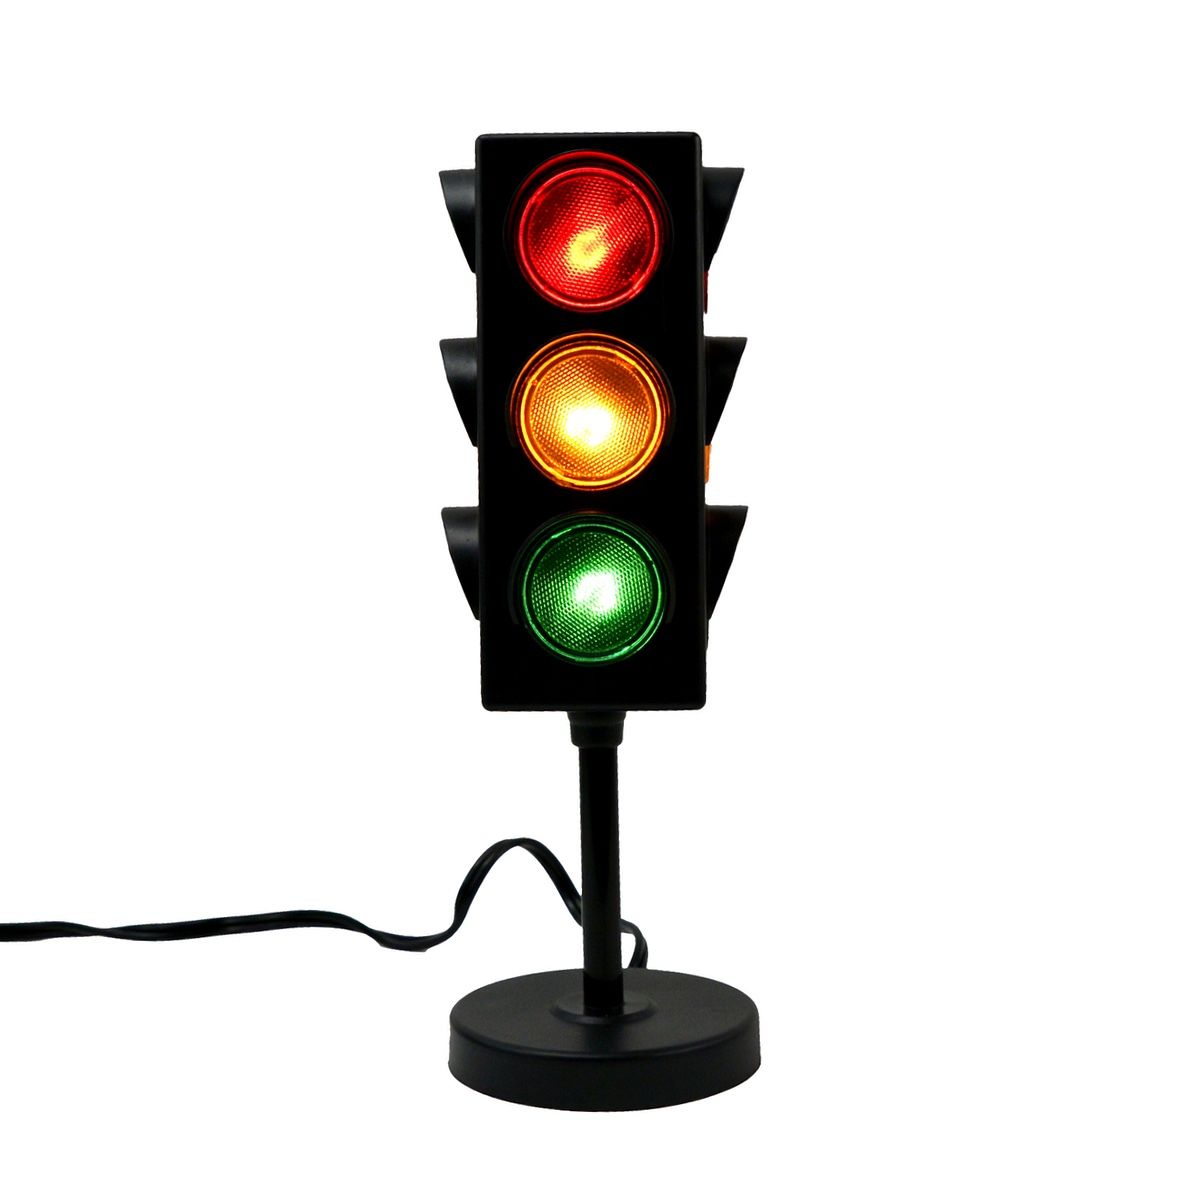 3 Color Traffic Light Desk Lamp Green Yellow Red Stop Signal Garage Shop Home Decor Walmart Com In 2020 Lamp Stop Light Desk Lamp